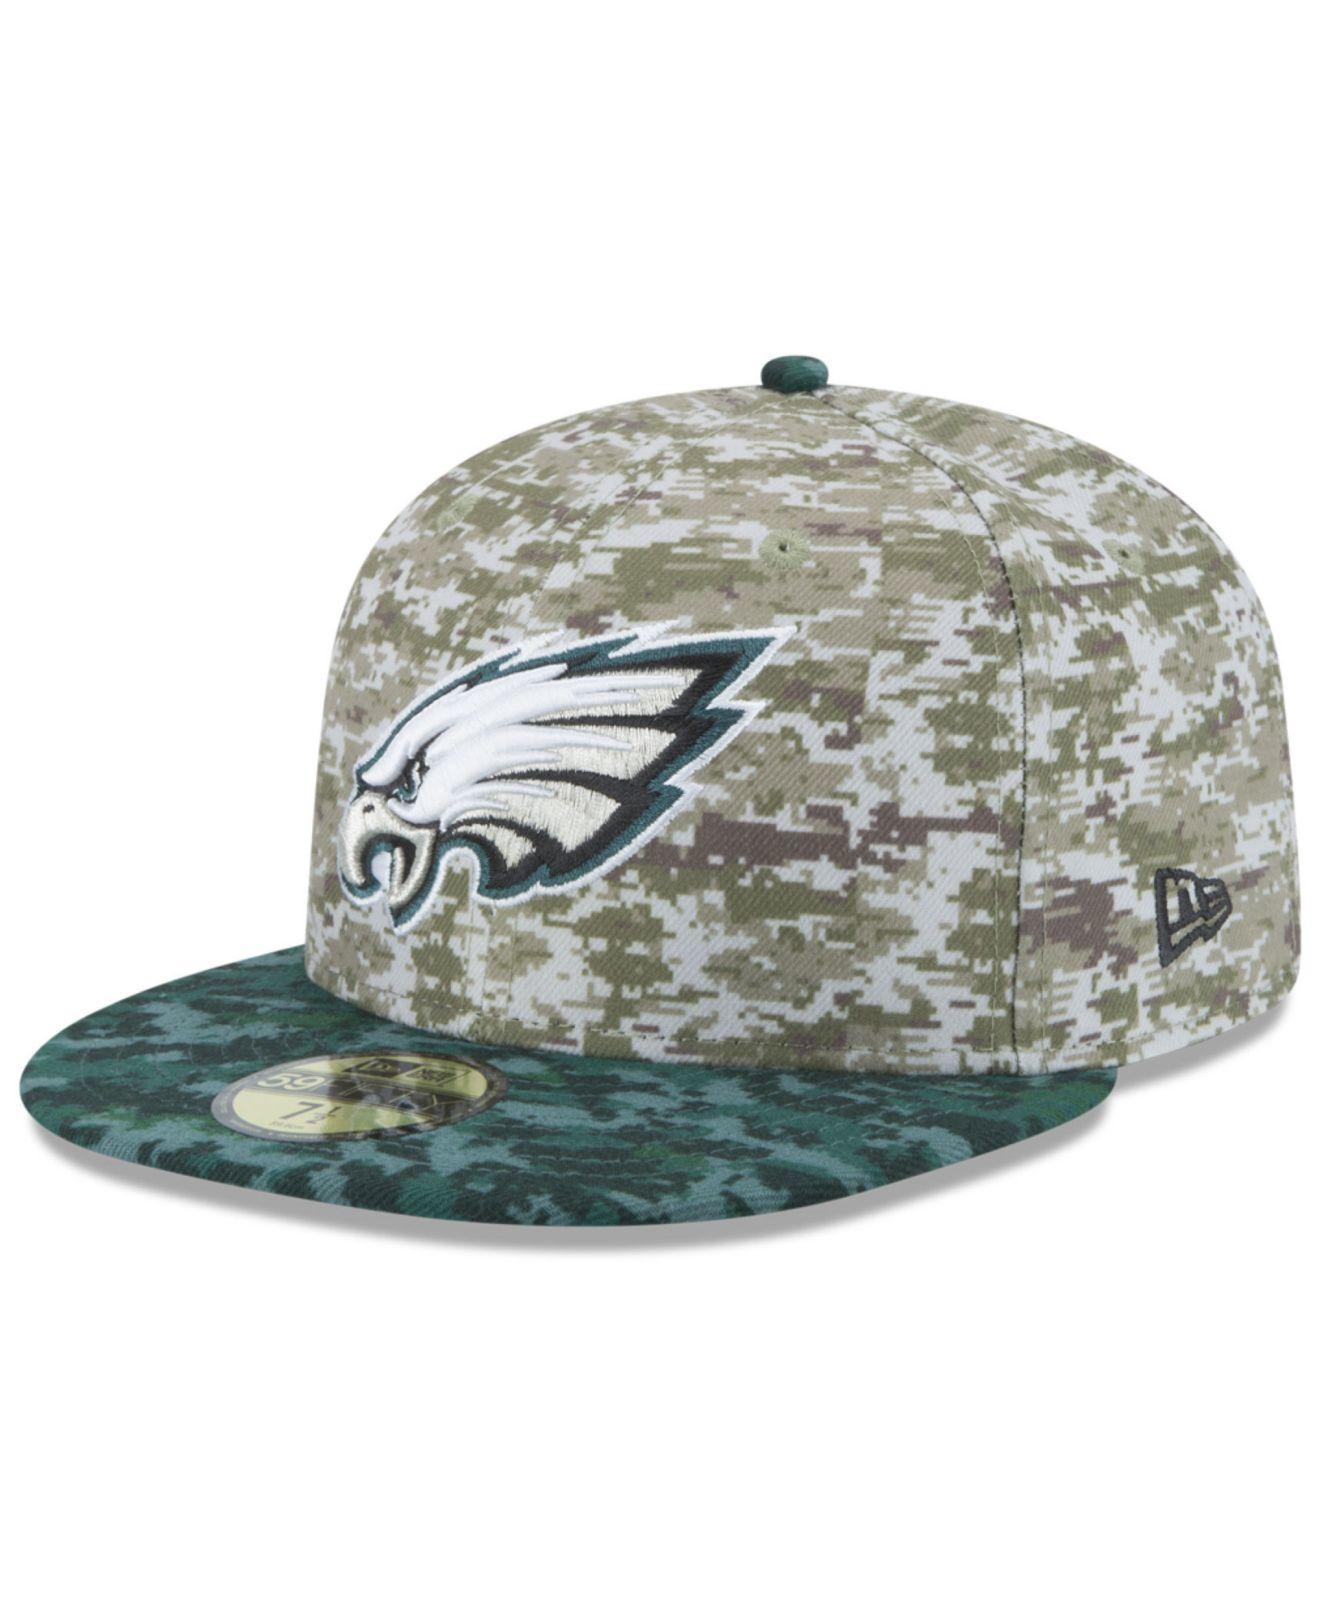 Lyst - Ktz Philadelphia Eagles Salute To Service 59fifty Cap in ... 18f1ce6422c7